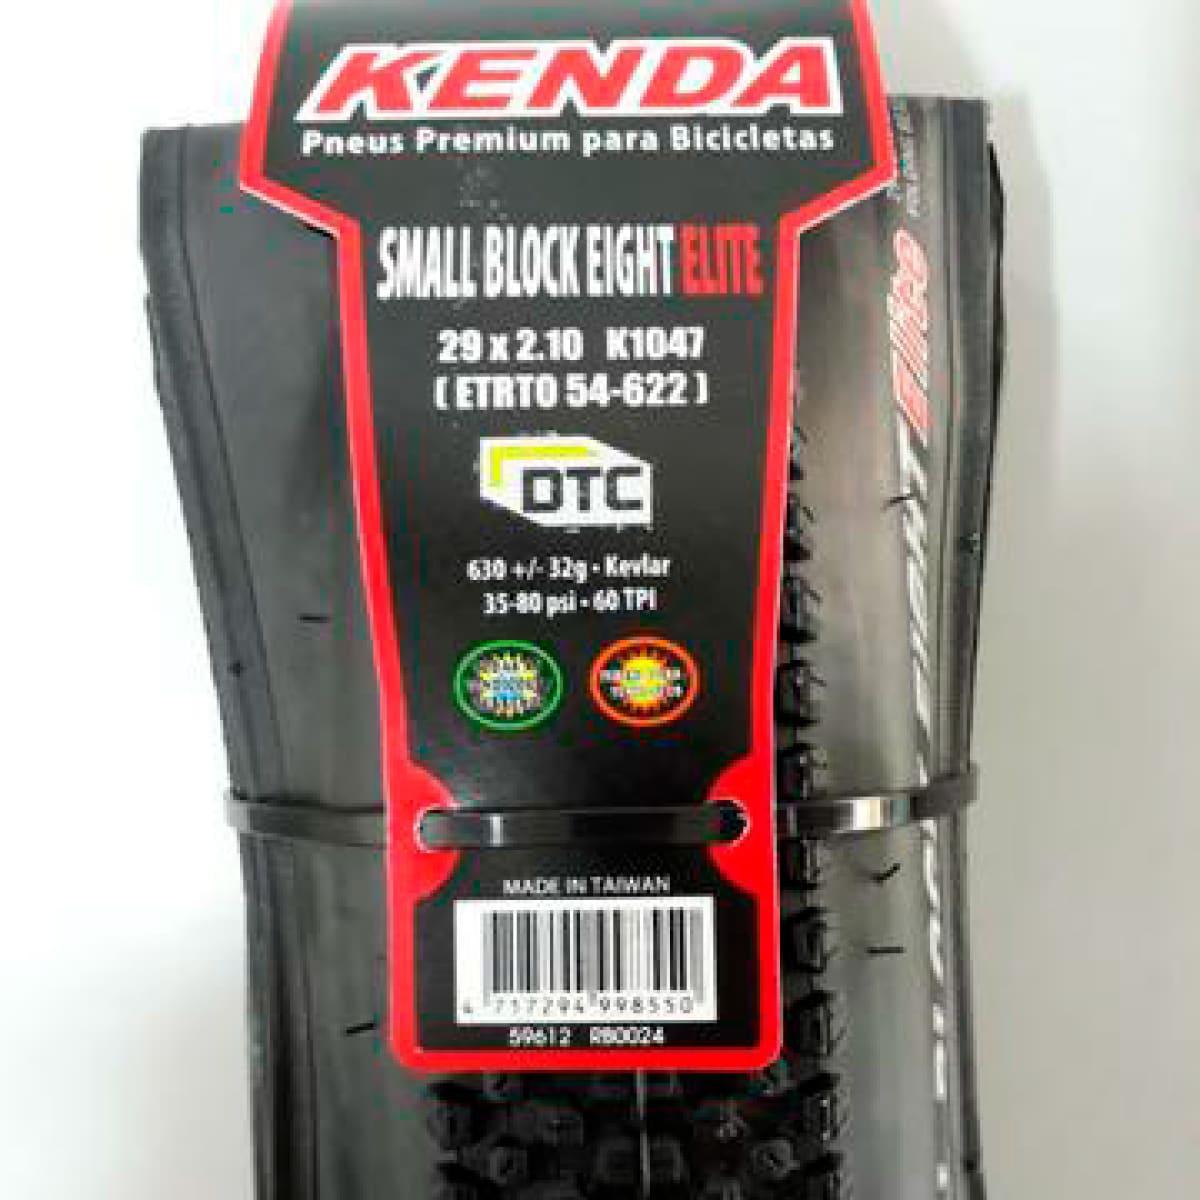 Pneu Kenda Small Block Eight Elite Aro 29